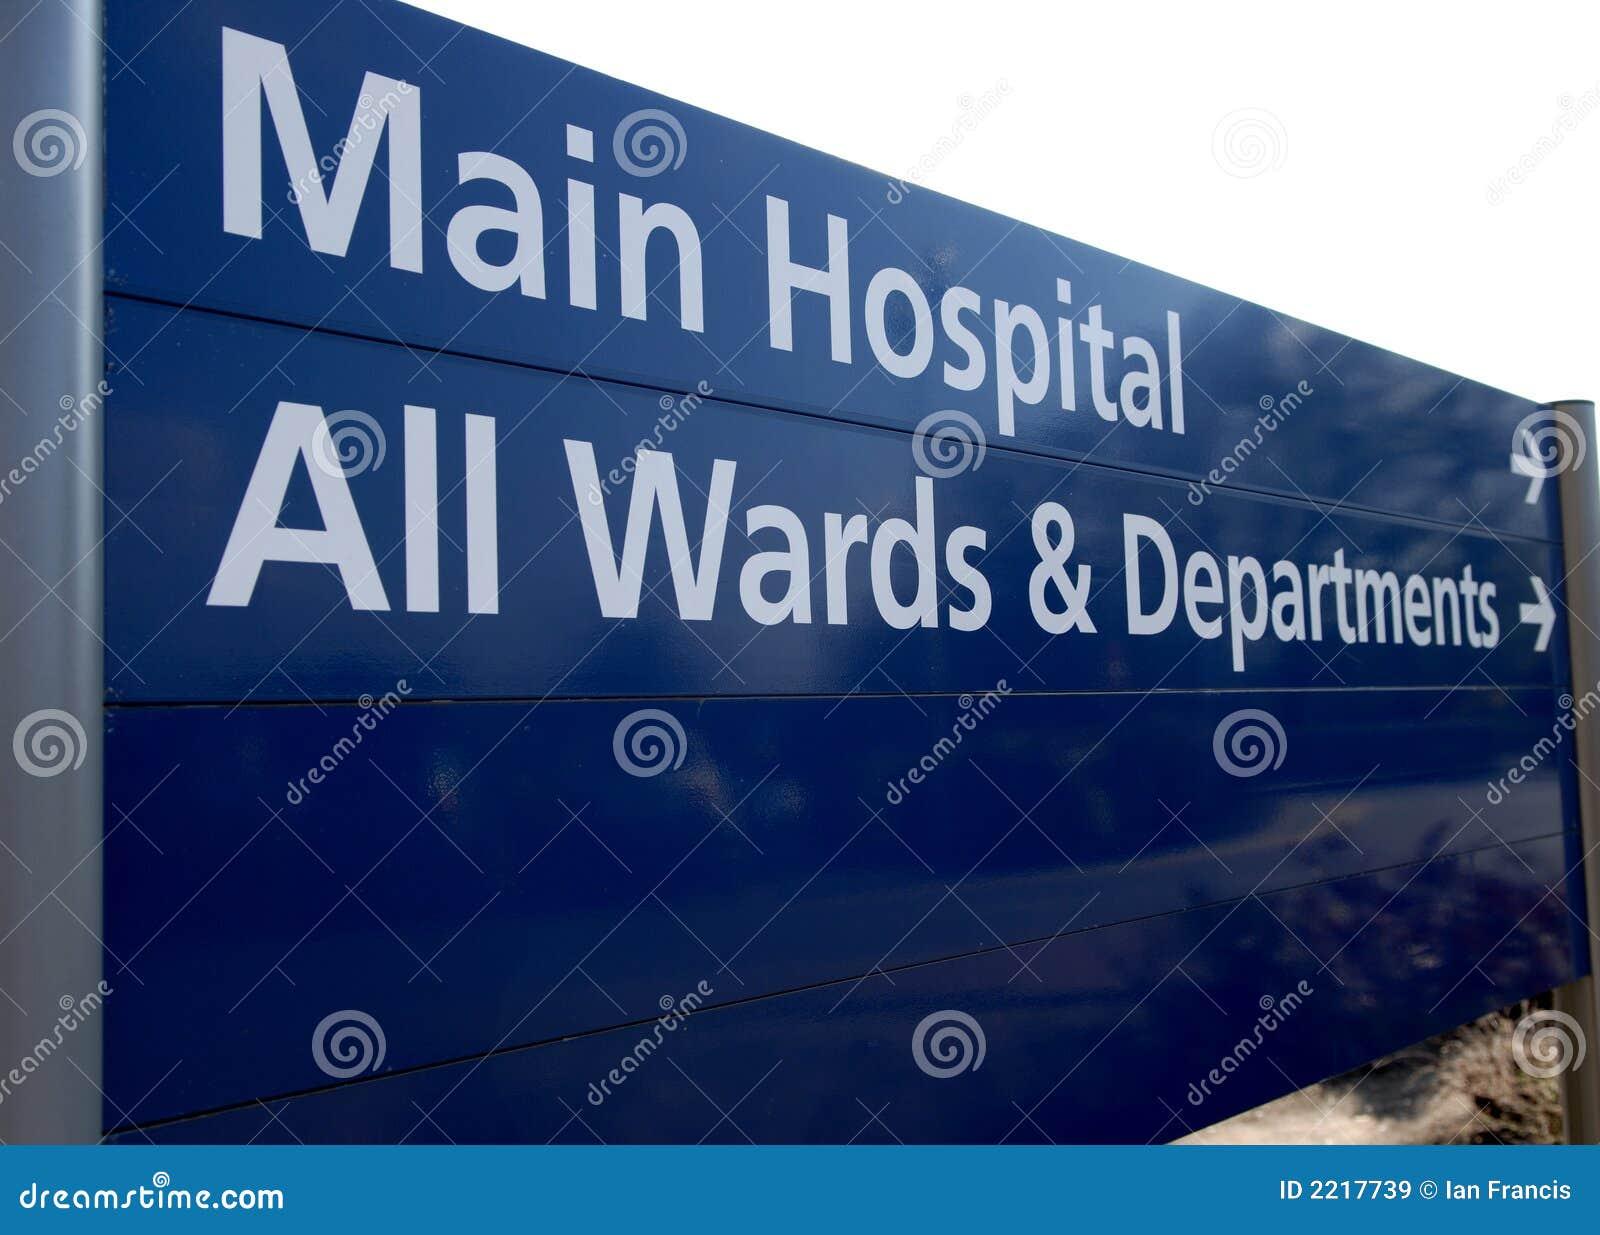 Hospital direction sign.